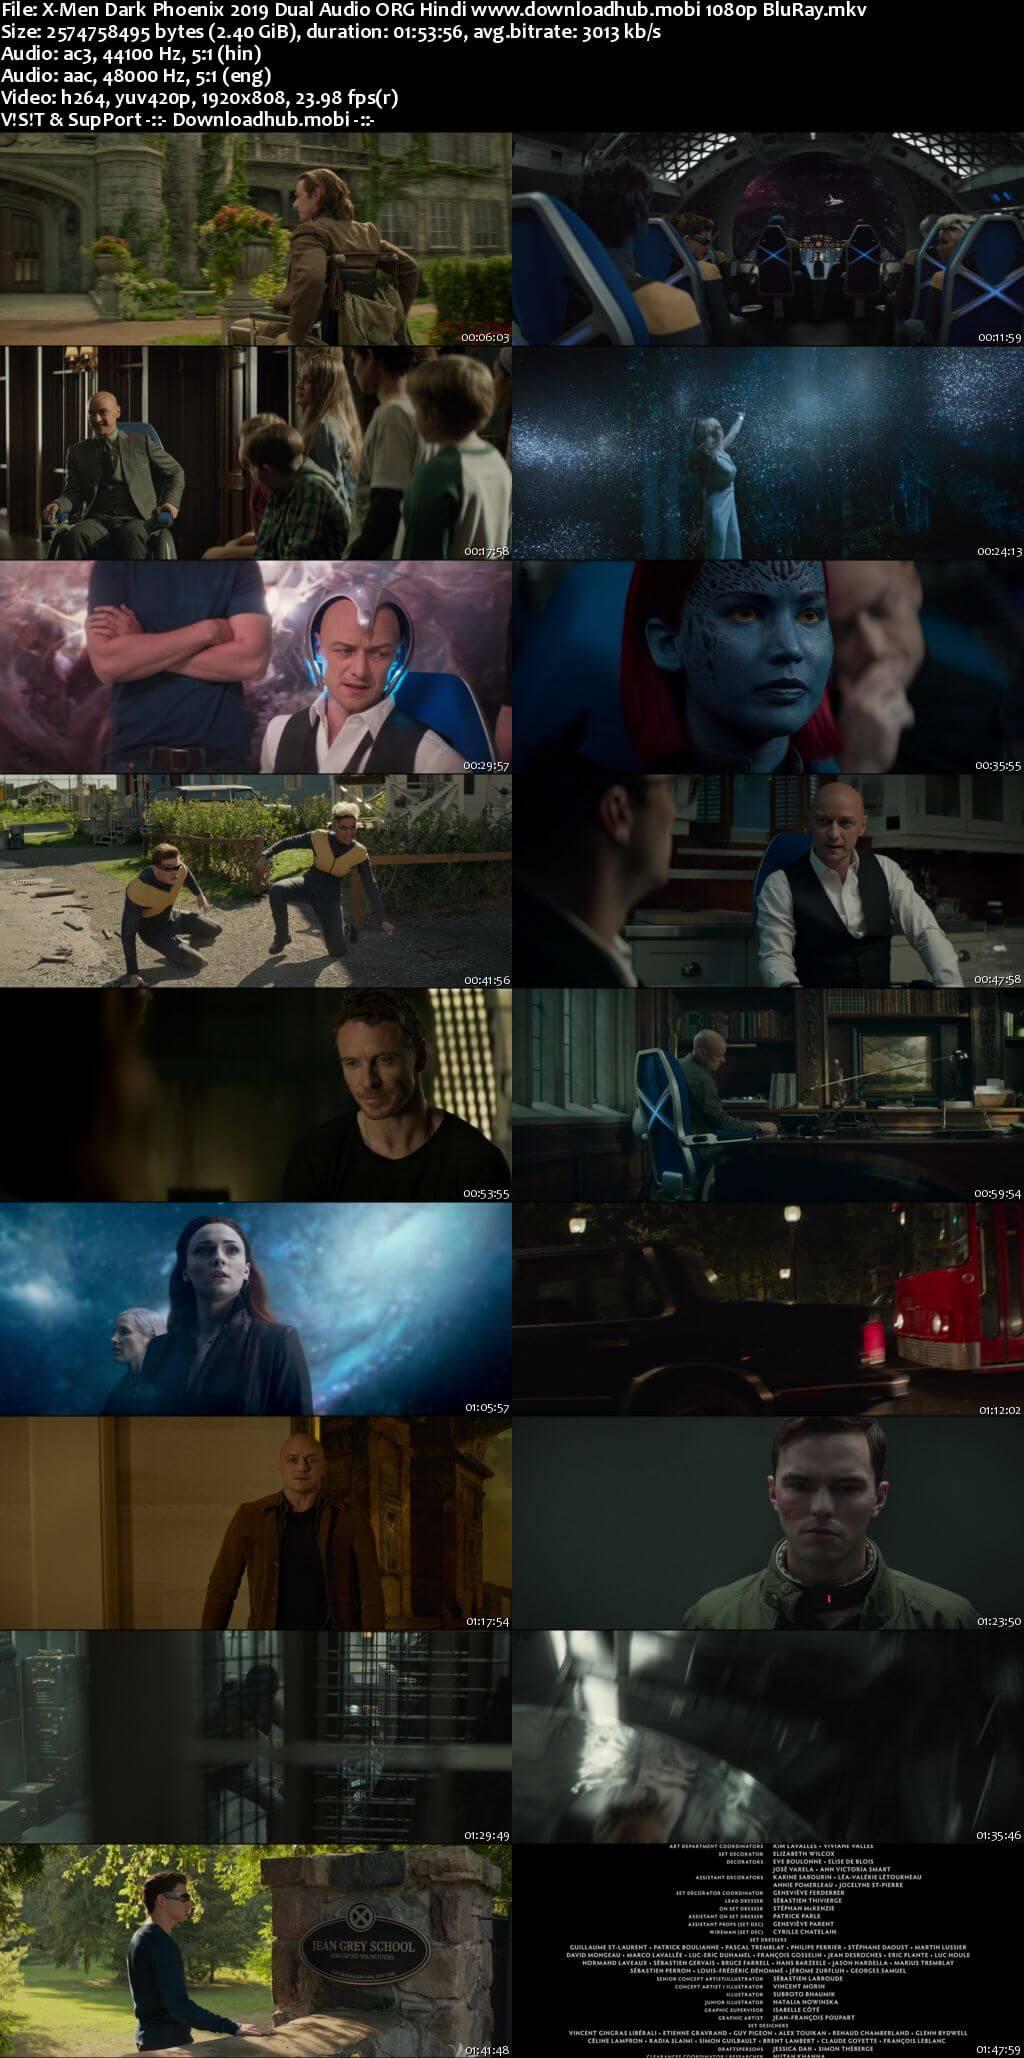 Dark Phoenix 2019 Hindi ORG Dual Audio 1080p BluRay ESubs